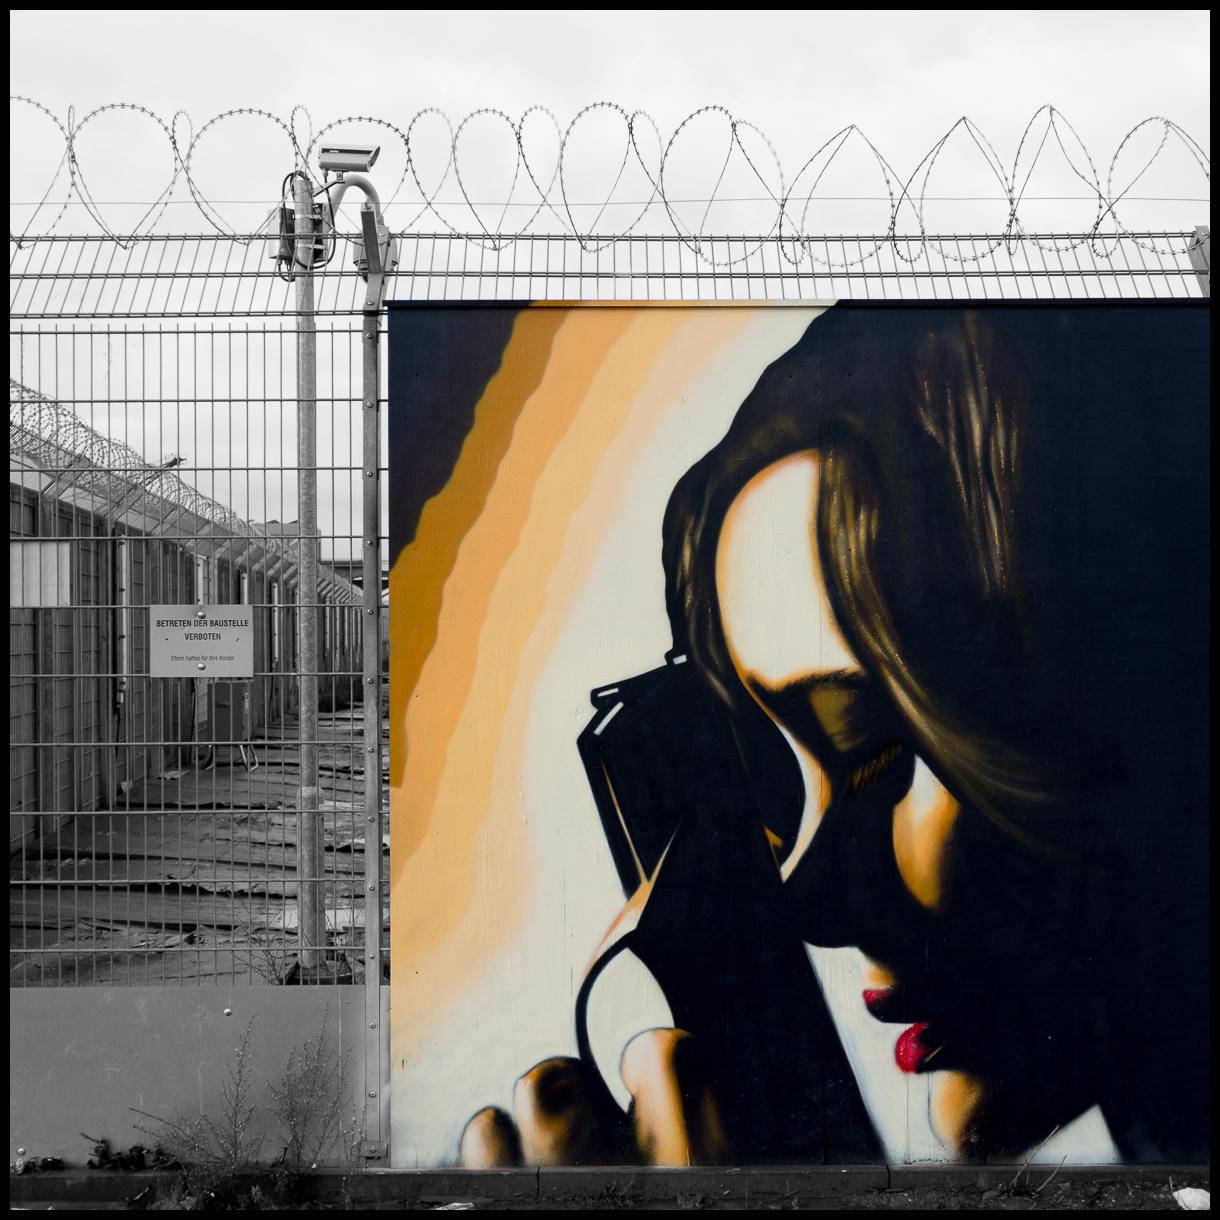 2012-12-15 X100 Frankfurt Graffiti Baustelle EZB 006